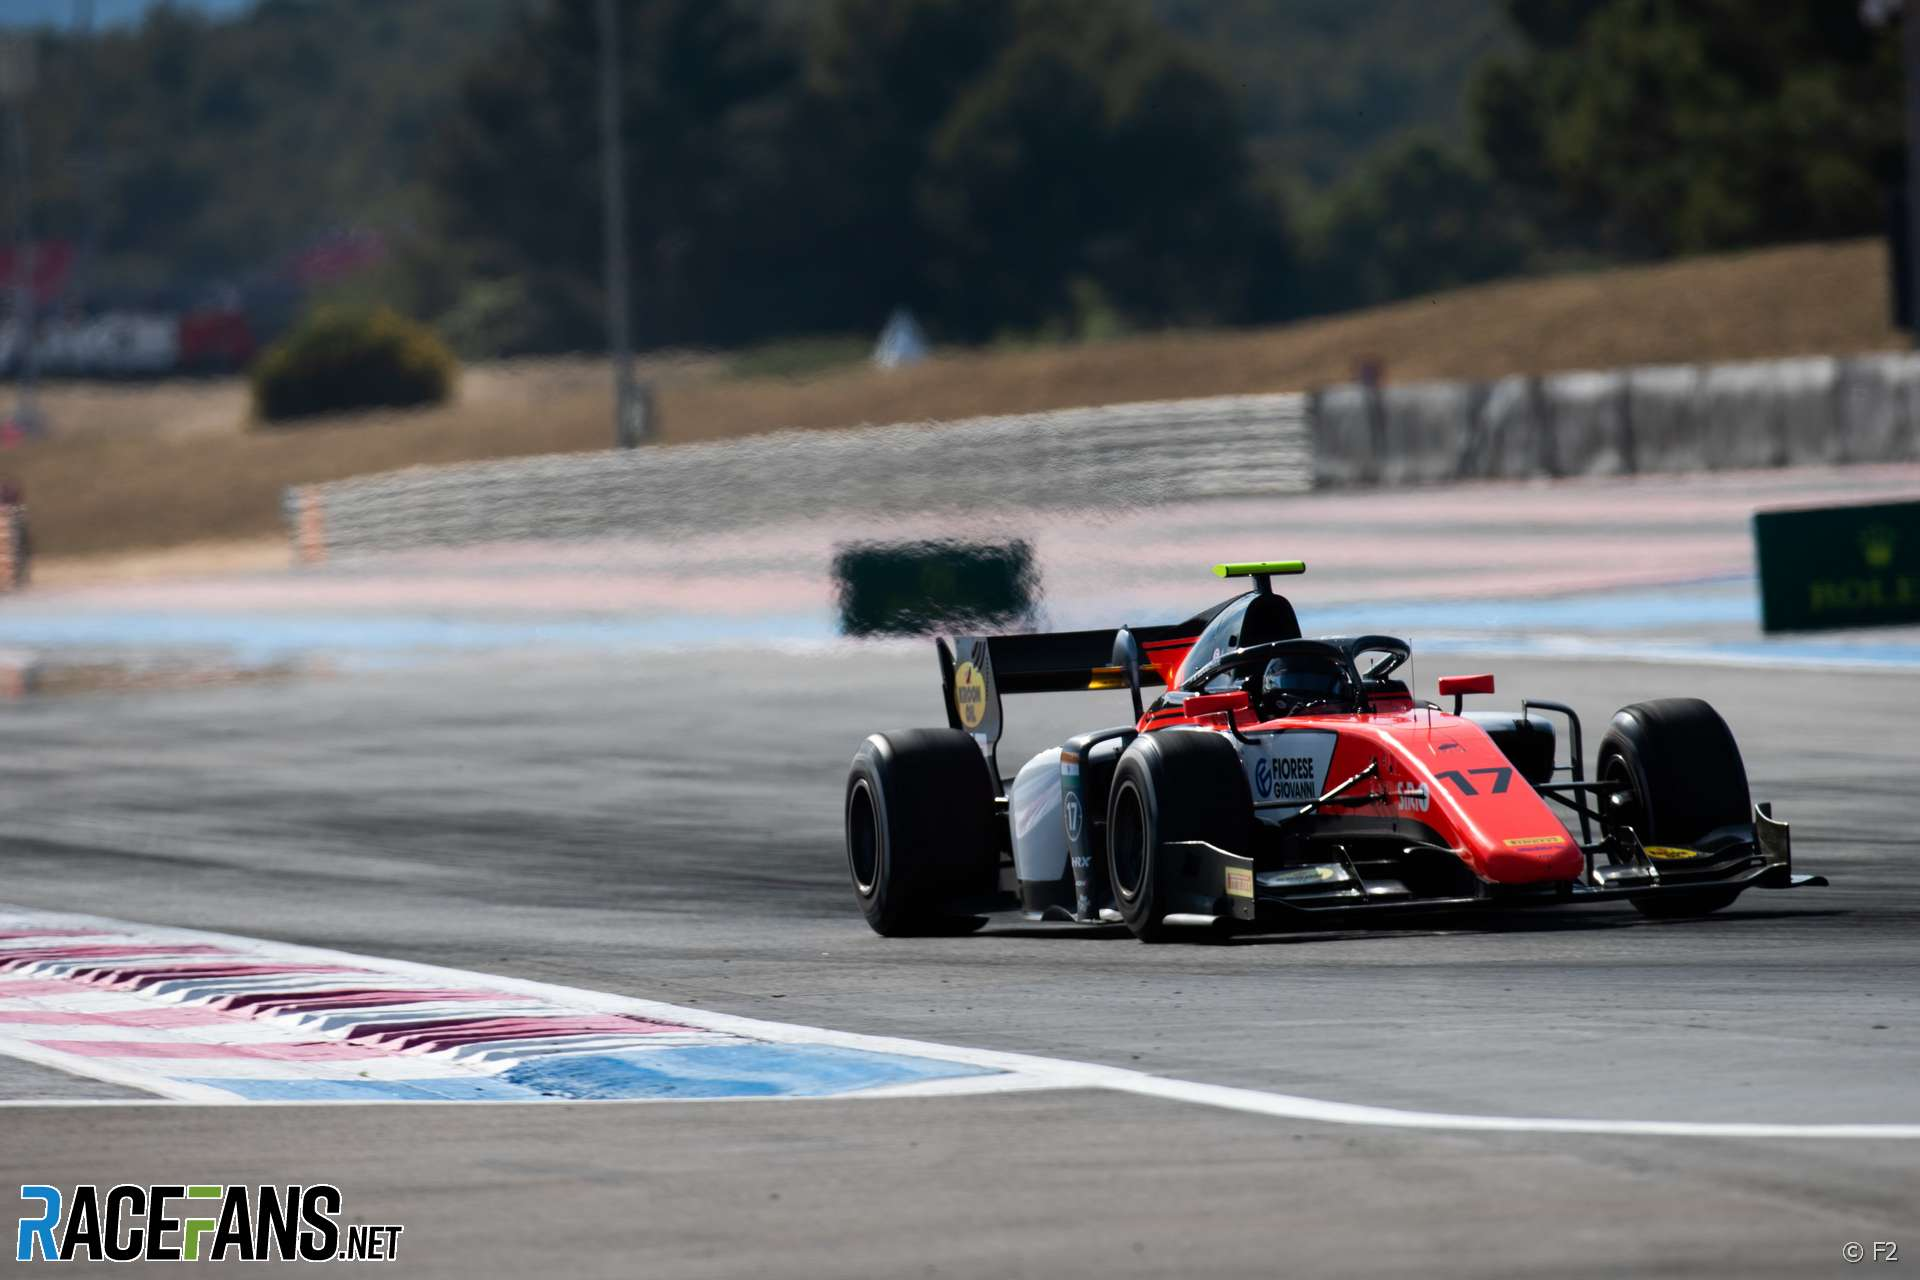 Mahaveer Raghunathan, F2, MP Motorsport, Paul Ricard, 2019